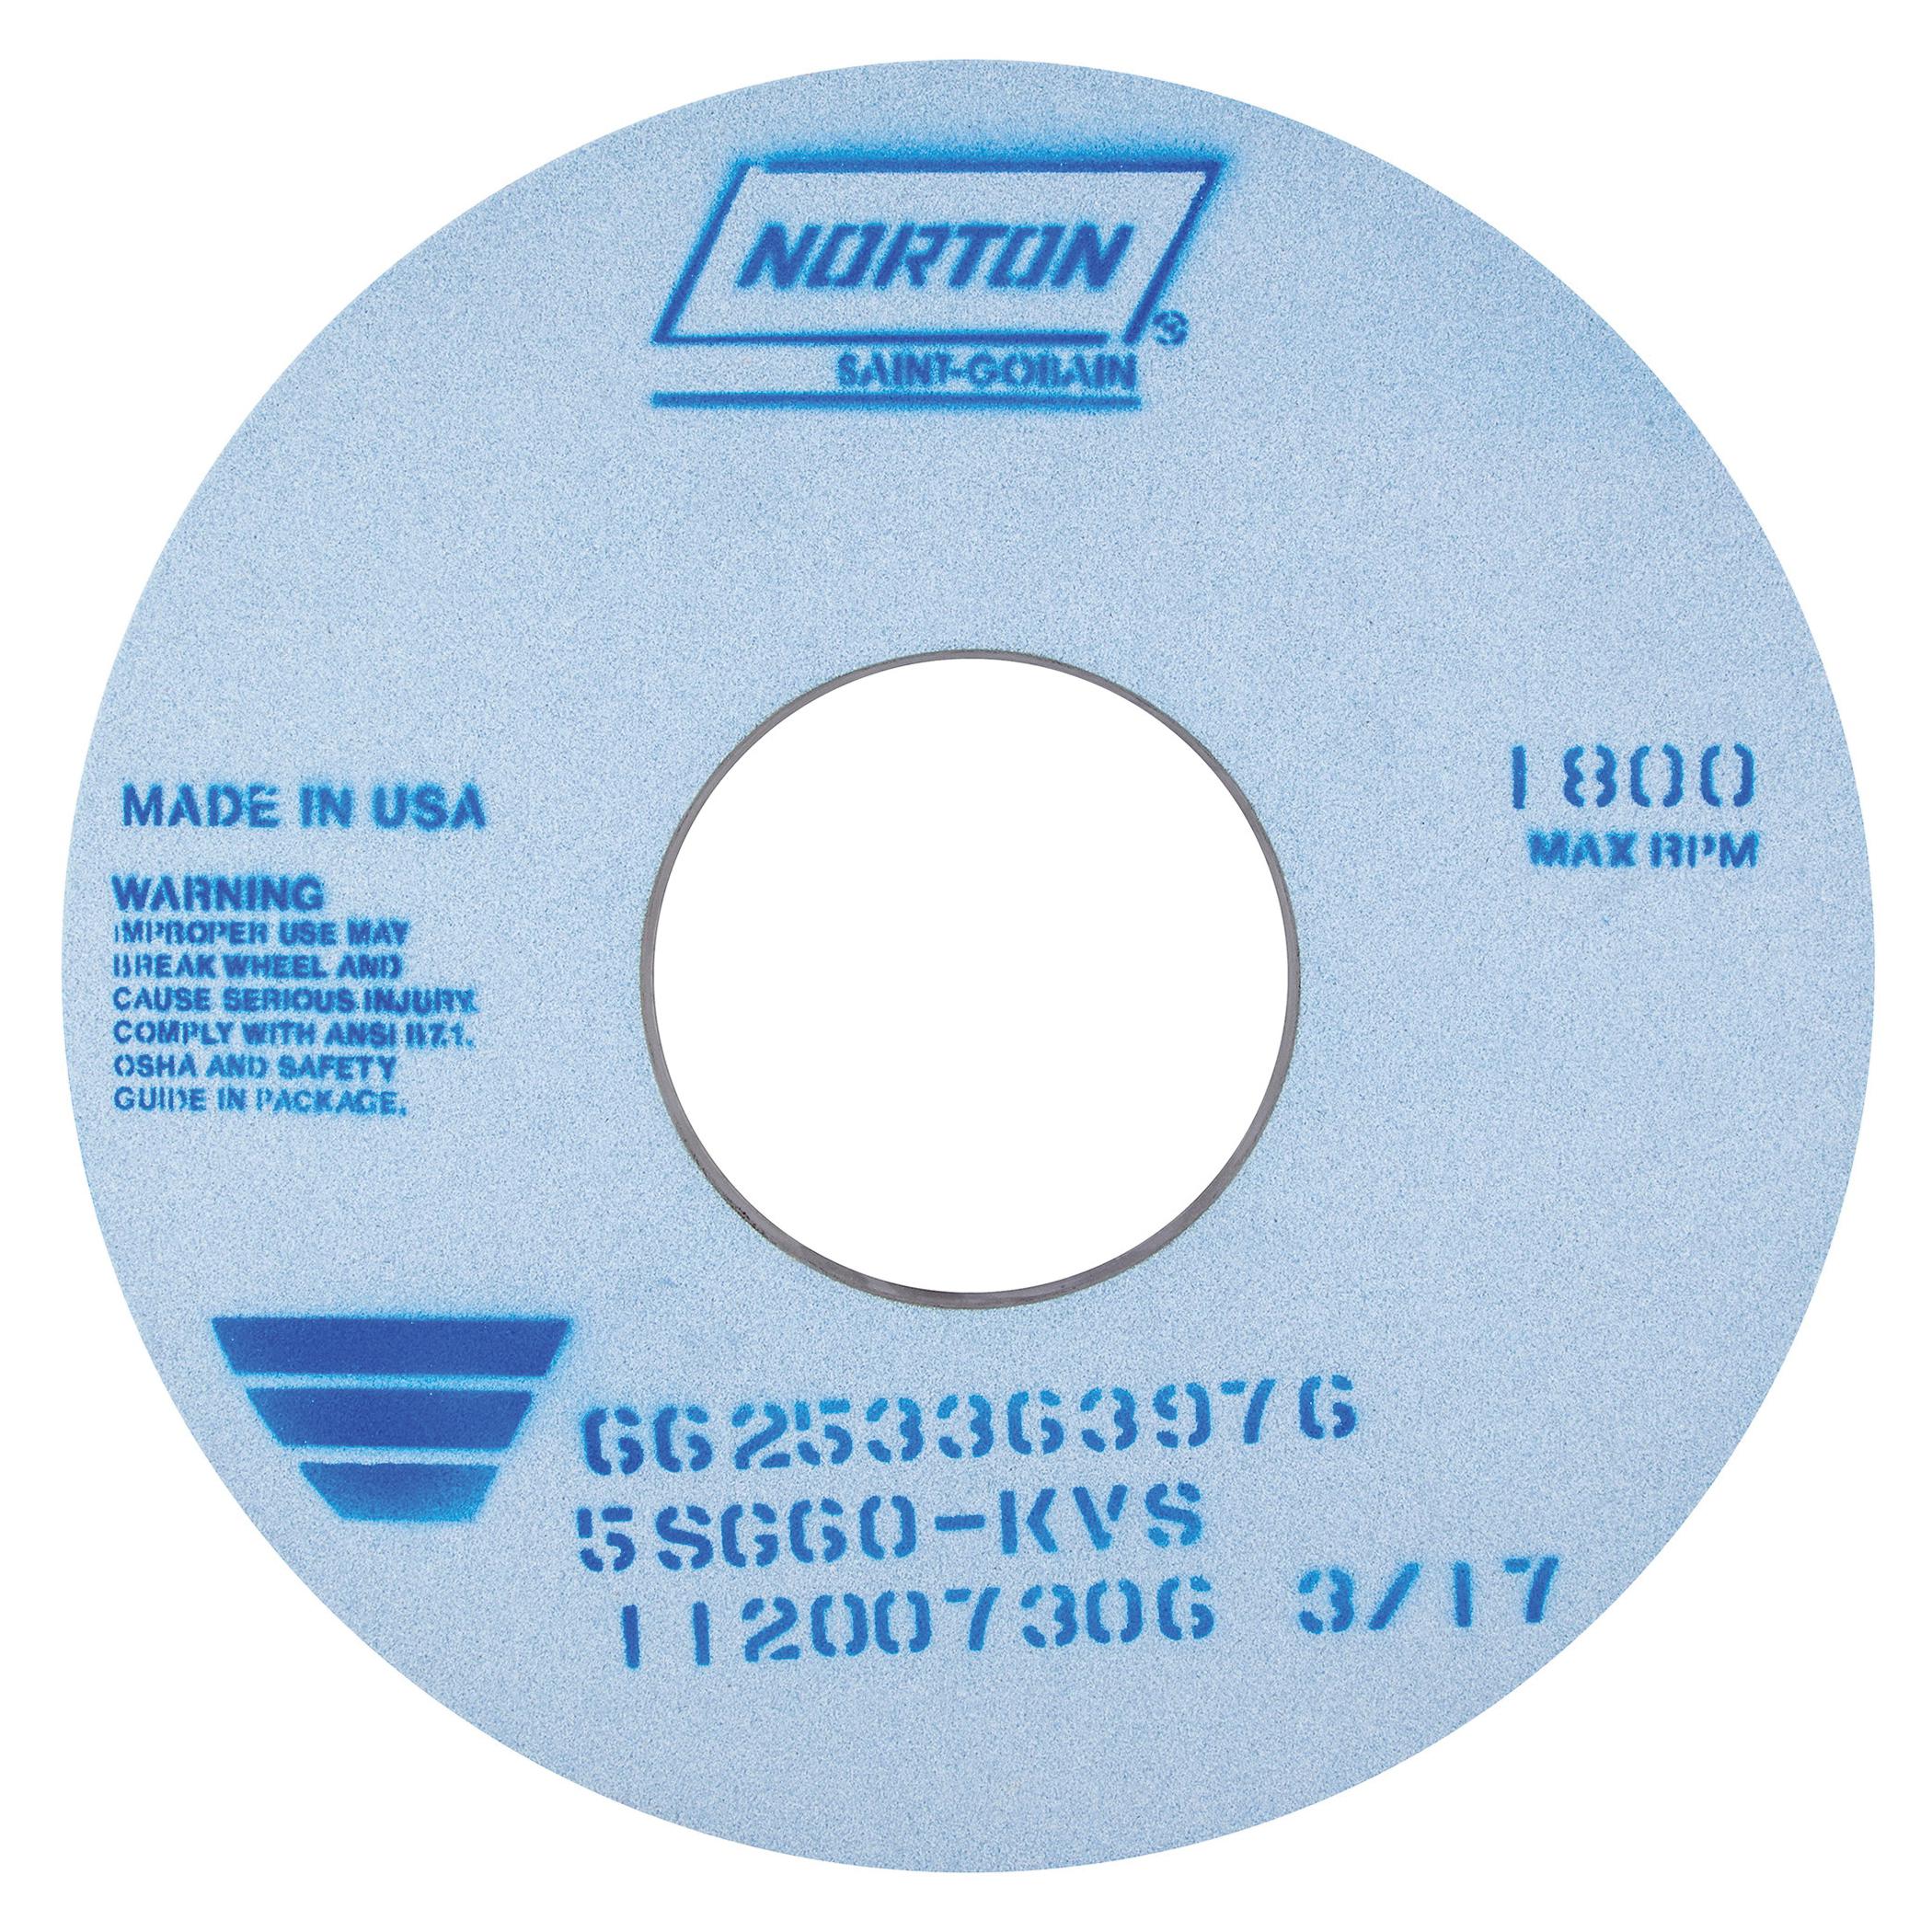 Norton® 66253363970 5SG Straight Toolroom Wheel, 14 in Dia x 1 in THK, 5 in Center Hole, 46 Grit, Ceramic Alumina/Friable Aluminum Oxide Abrasive